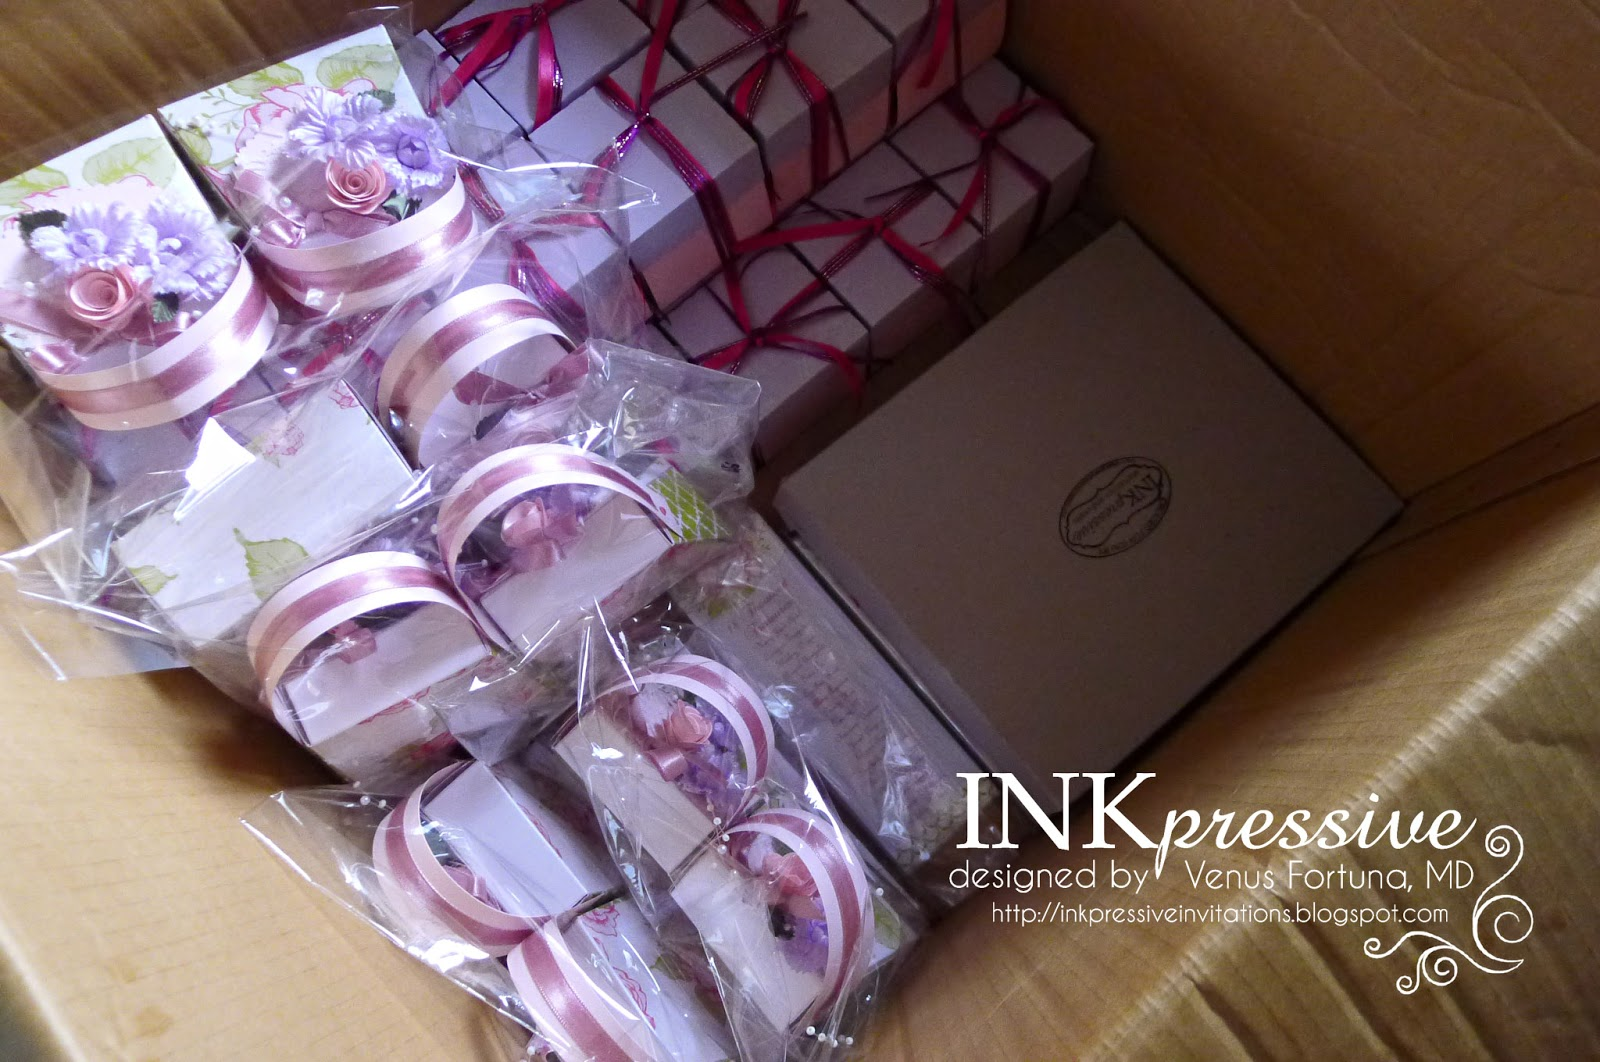 Purple Pink Purse Invitation Marie Antoinette Inspired | INKPRESSIVE ...